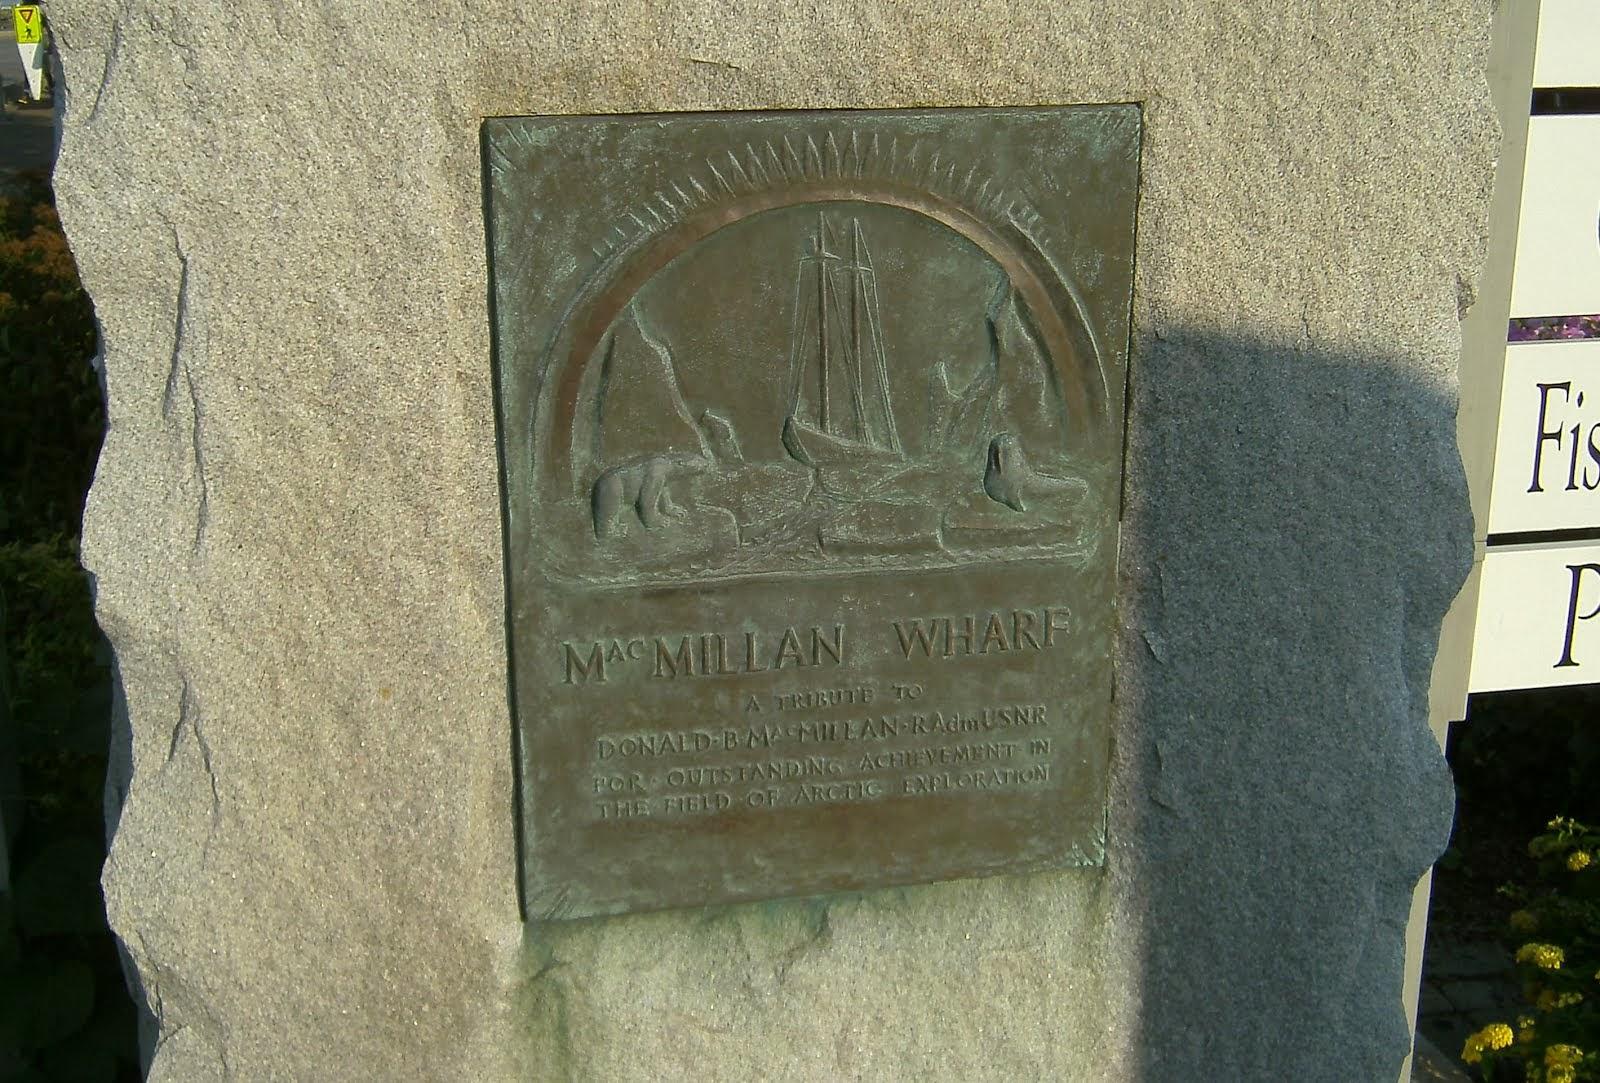 MacMillan Wharf Plaque